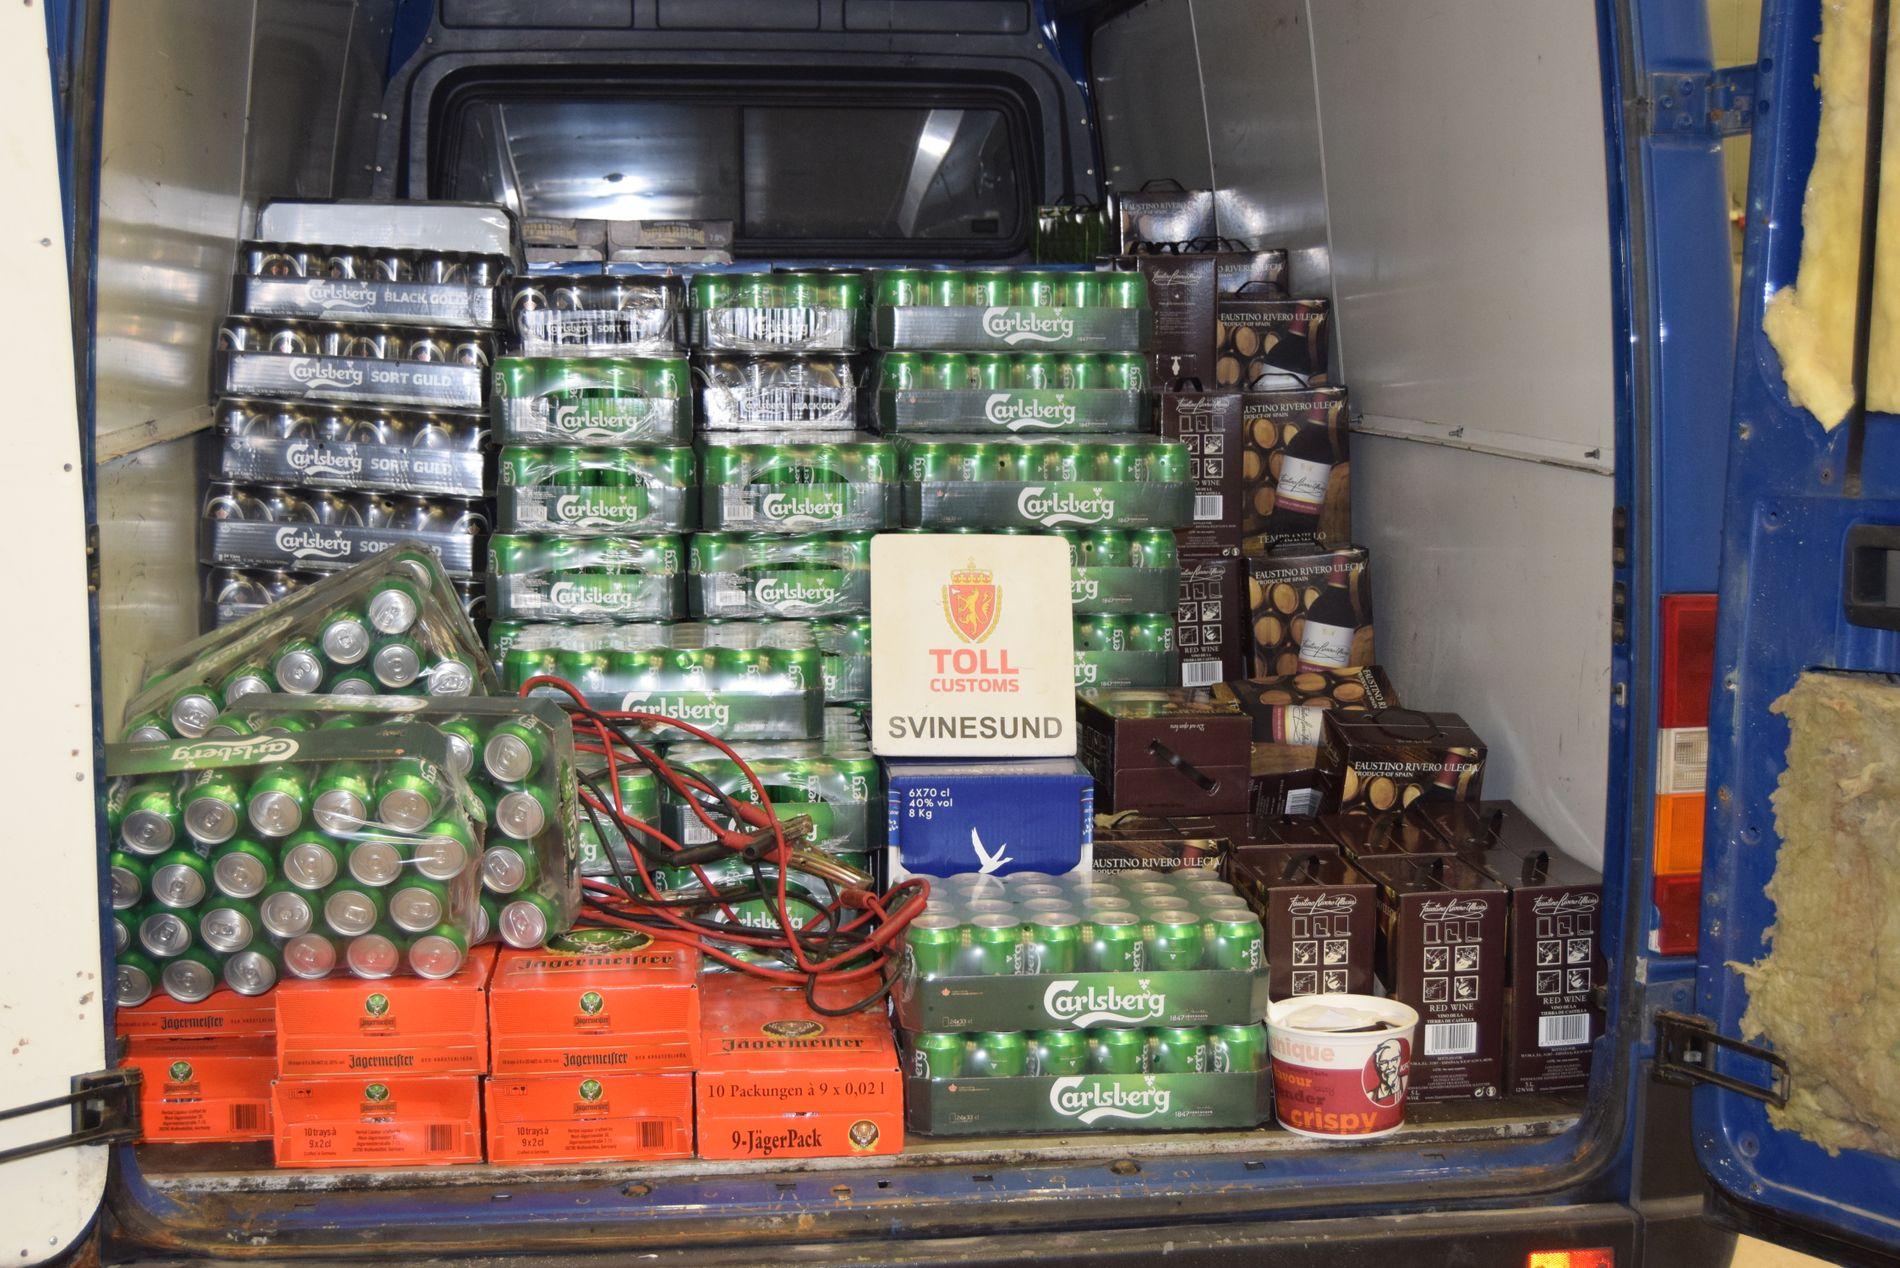 BESLAG: Dette fant tollerne onsdag da de åpnet bagasjerommet på en norsk varebil på Svinesund.